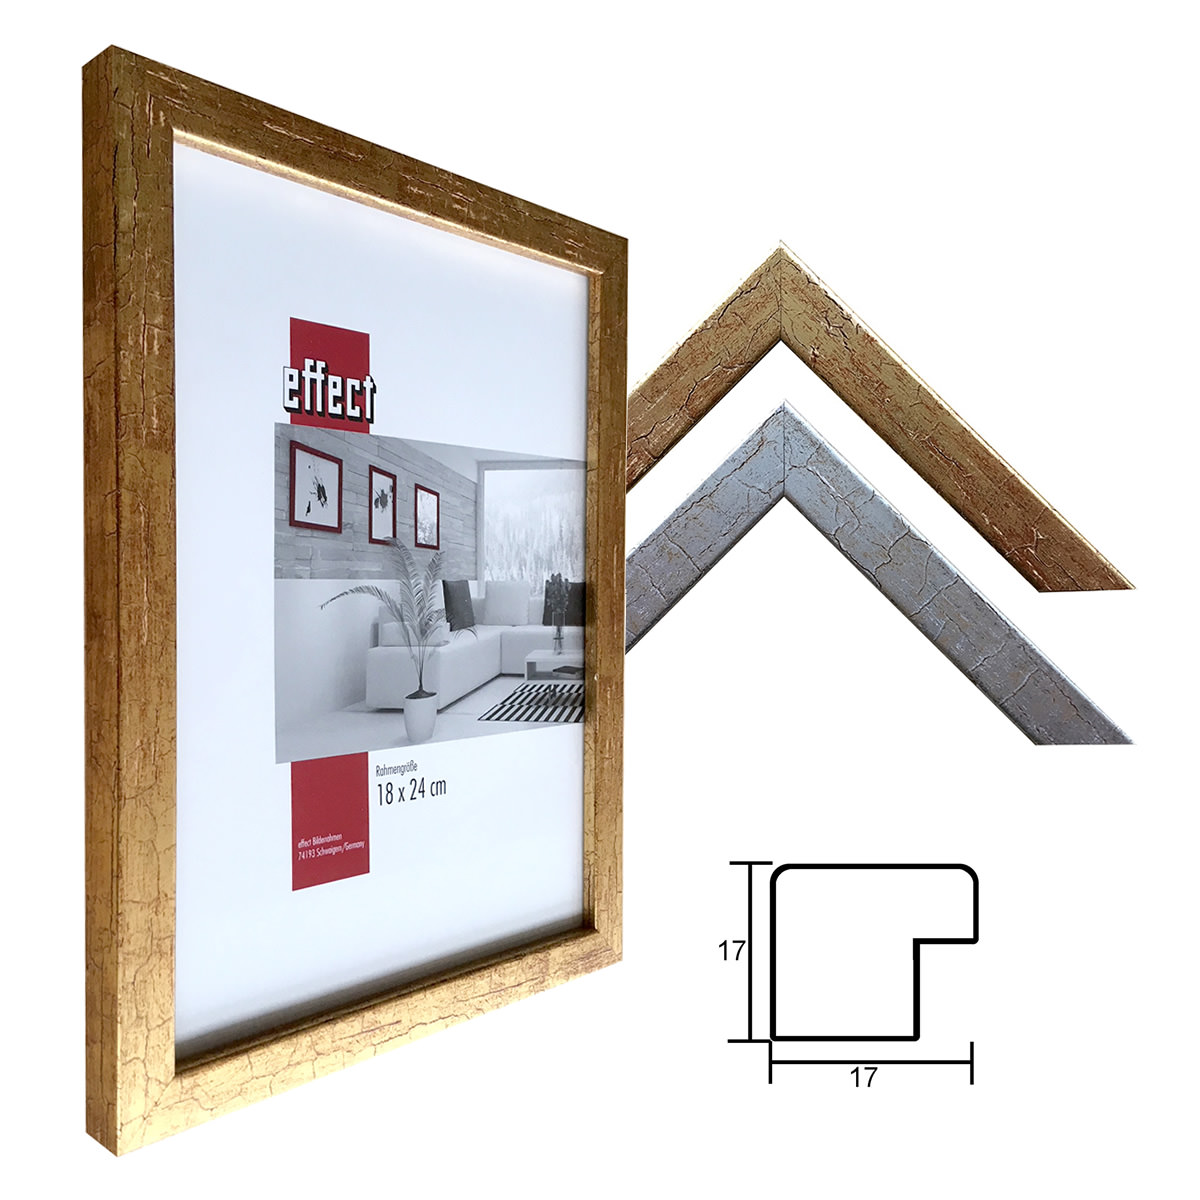 galerie bilderrahmen aus holz profil 51 bilderrahmen. Black Bedroom Furniture Sets. Home Design Ideas